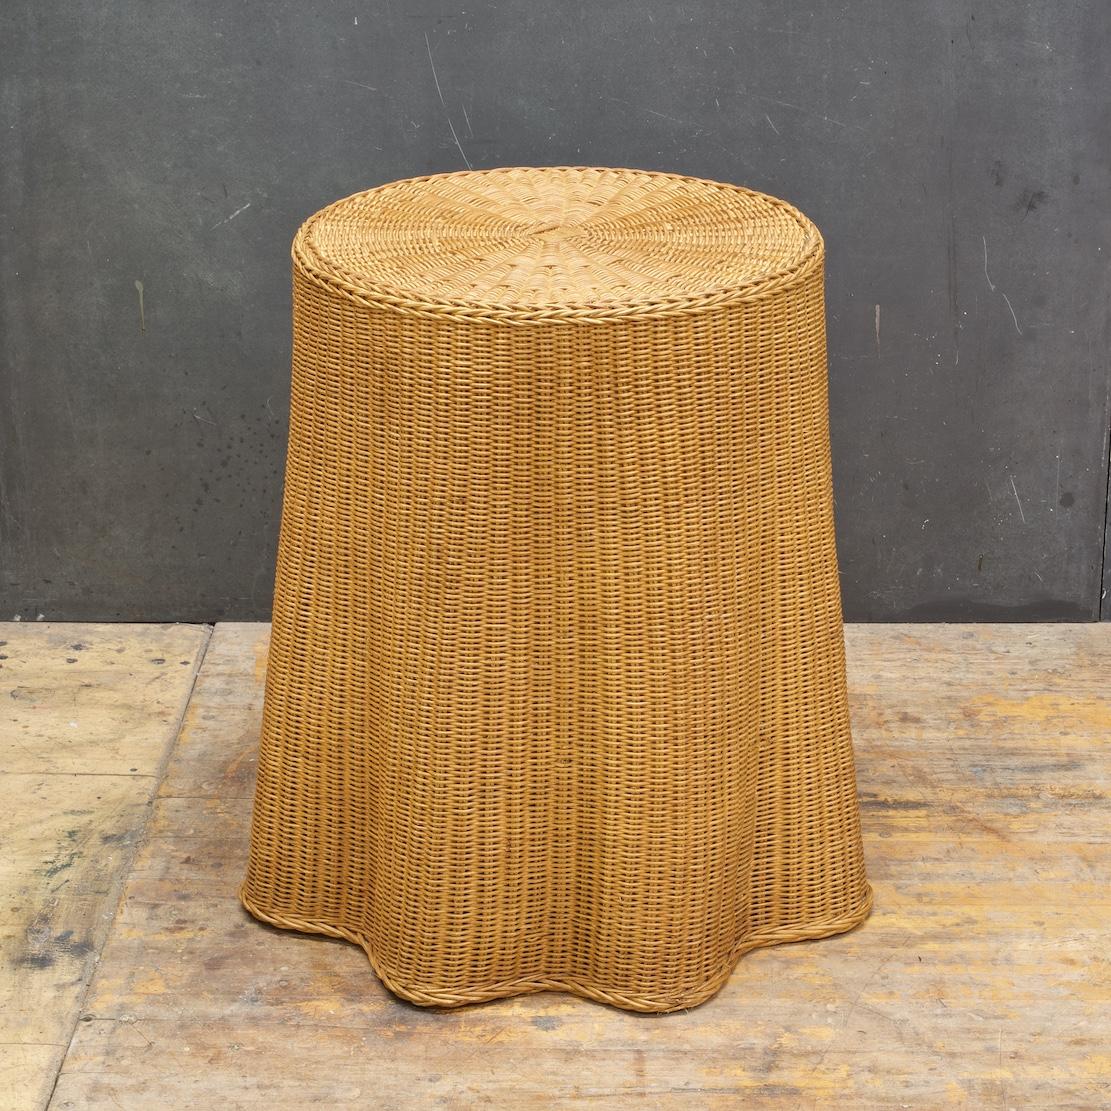 Trompe Lu0027oeil Vintage Rattan Draped Wicker Ghost Round Table Pedestal Rare